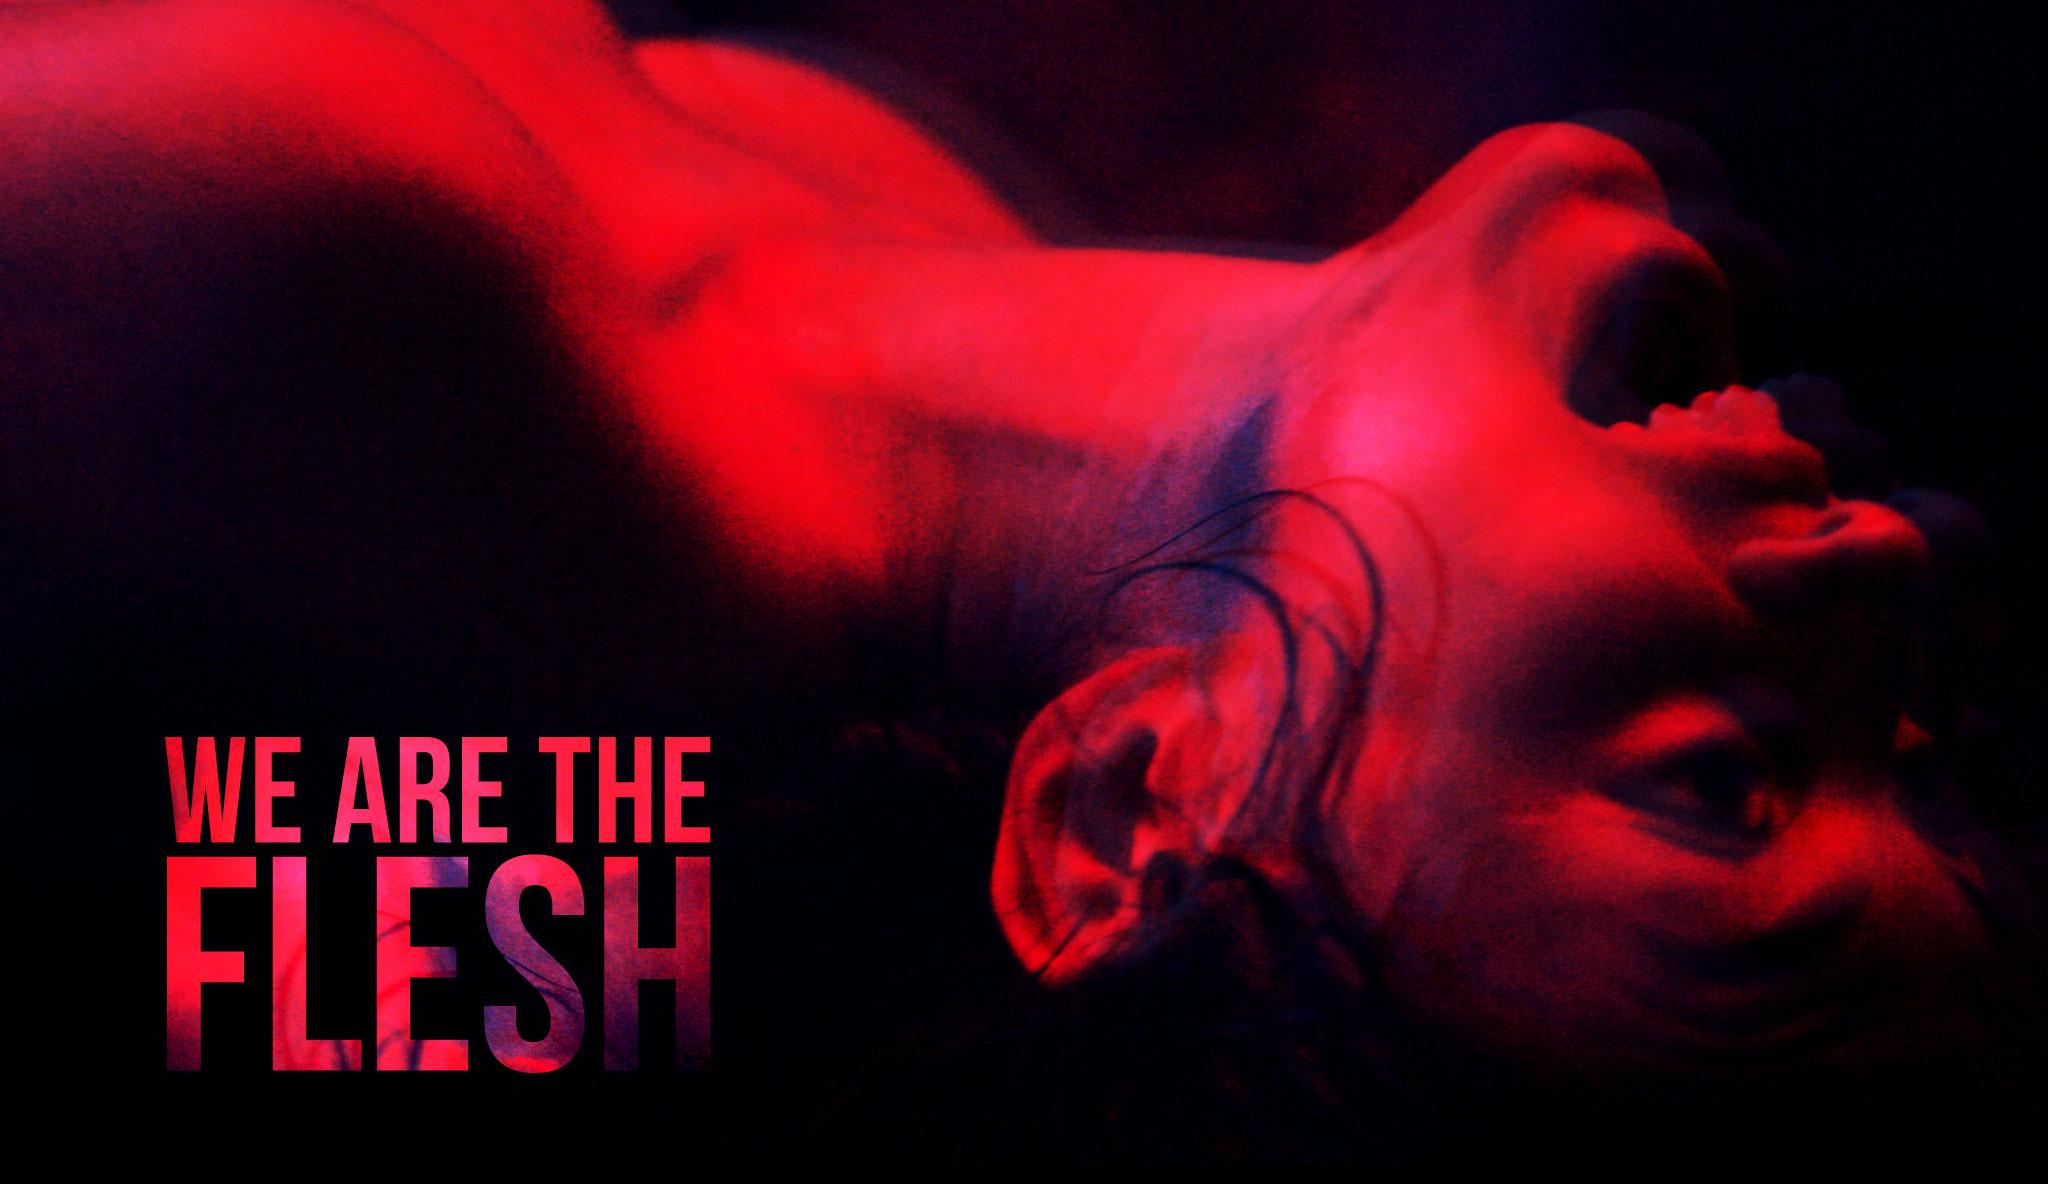 we-are-the-flesh\header.jpg